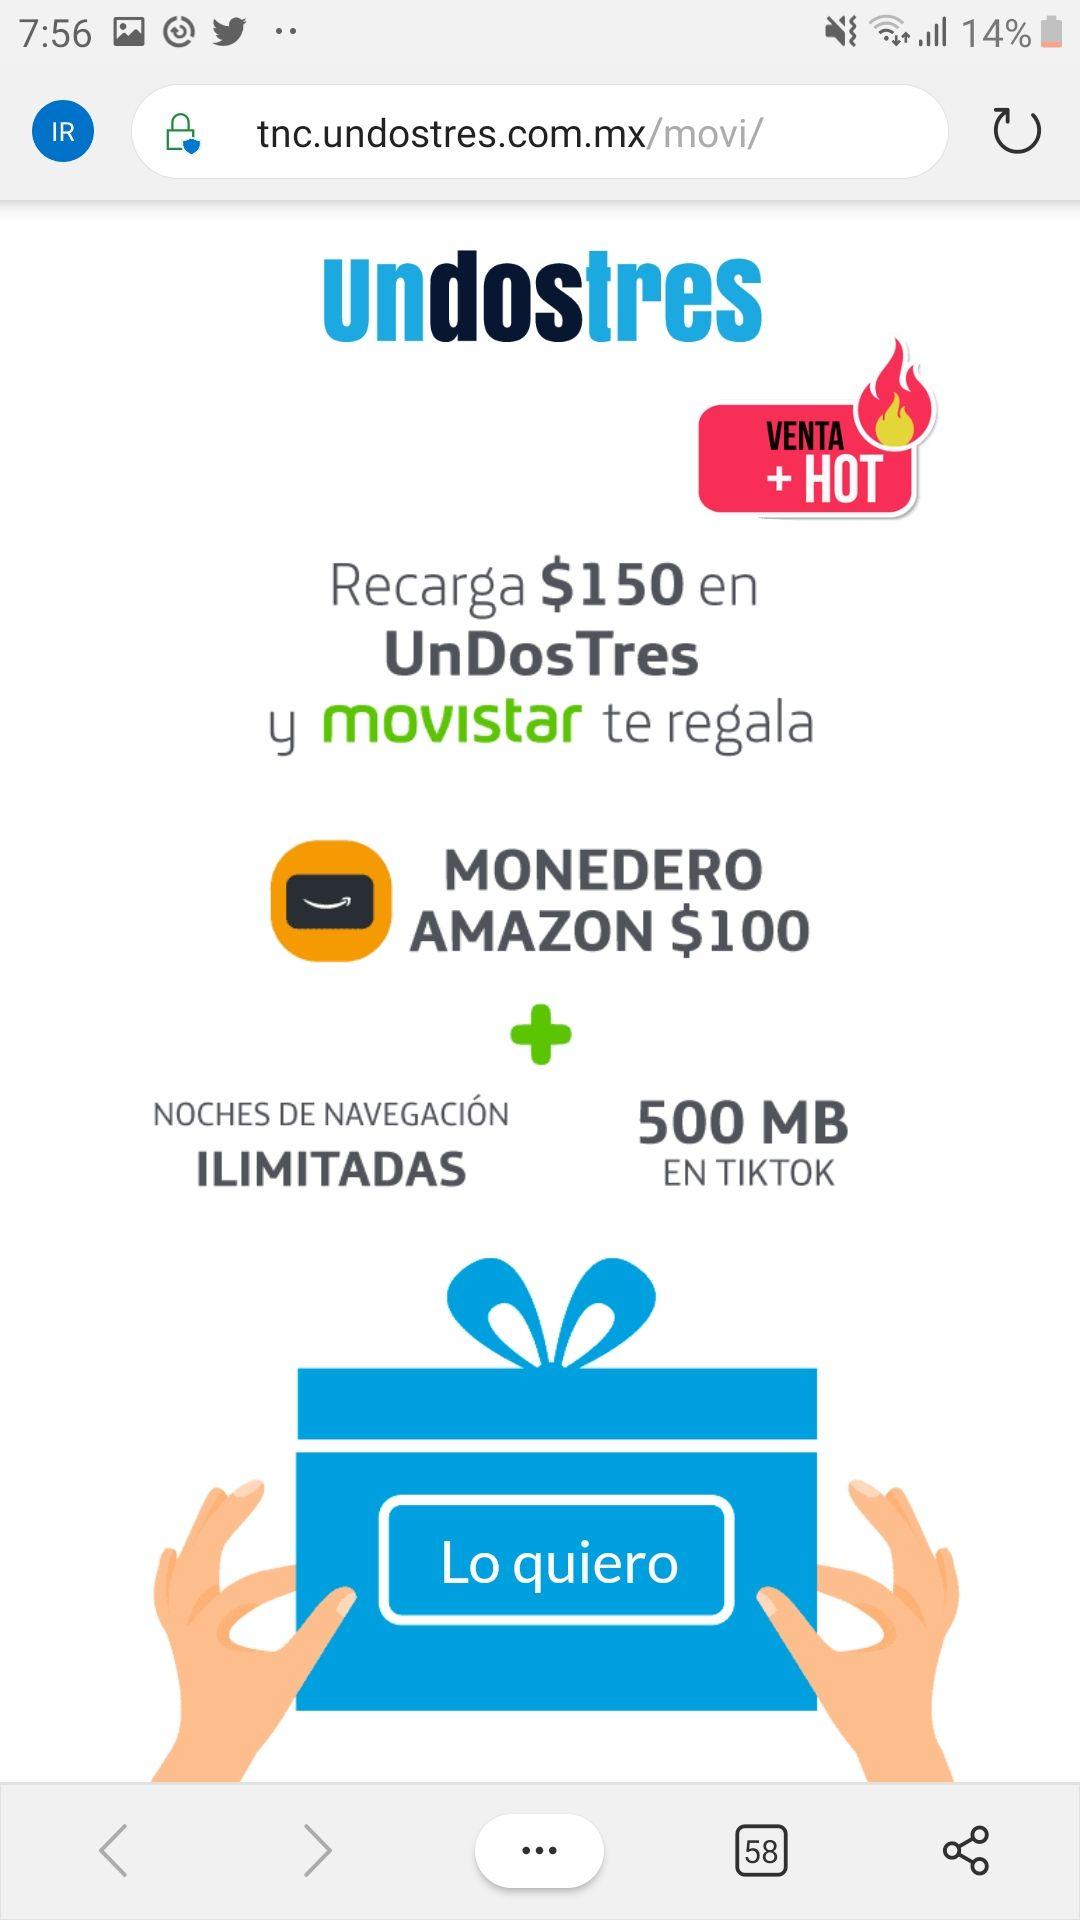 UNDOSTRES: $100 en monedero Amazon con recarga de $150 Movistar.